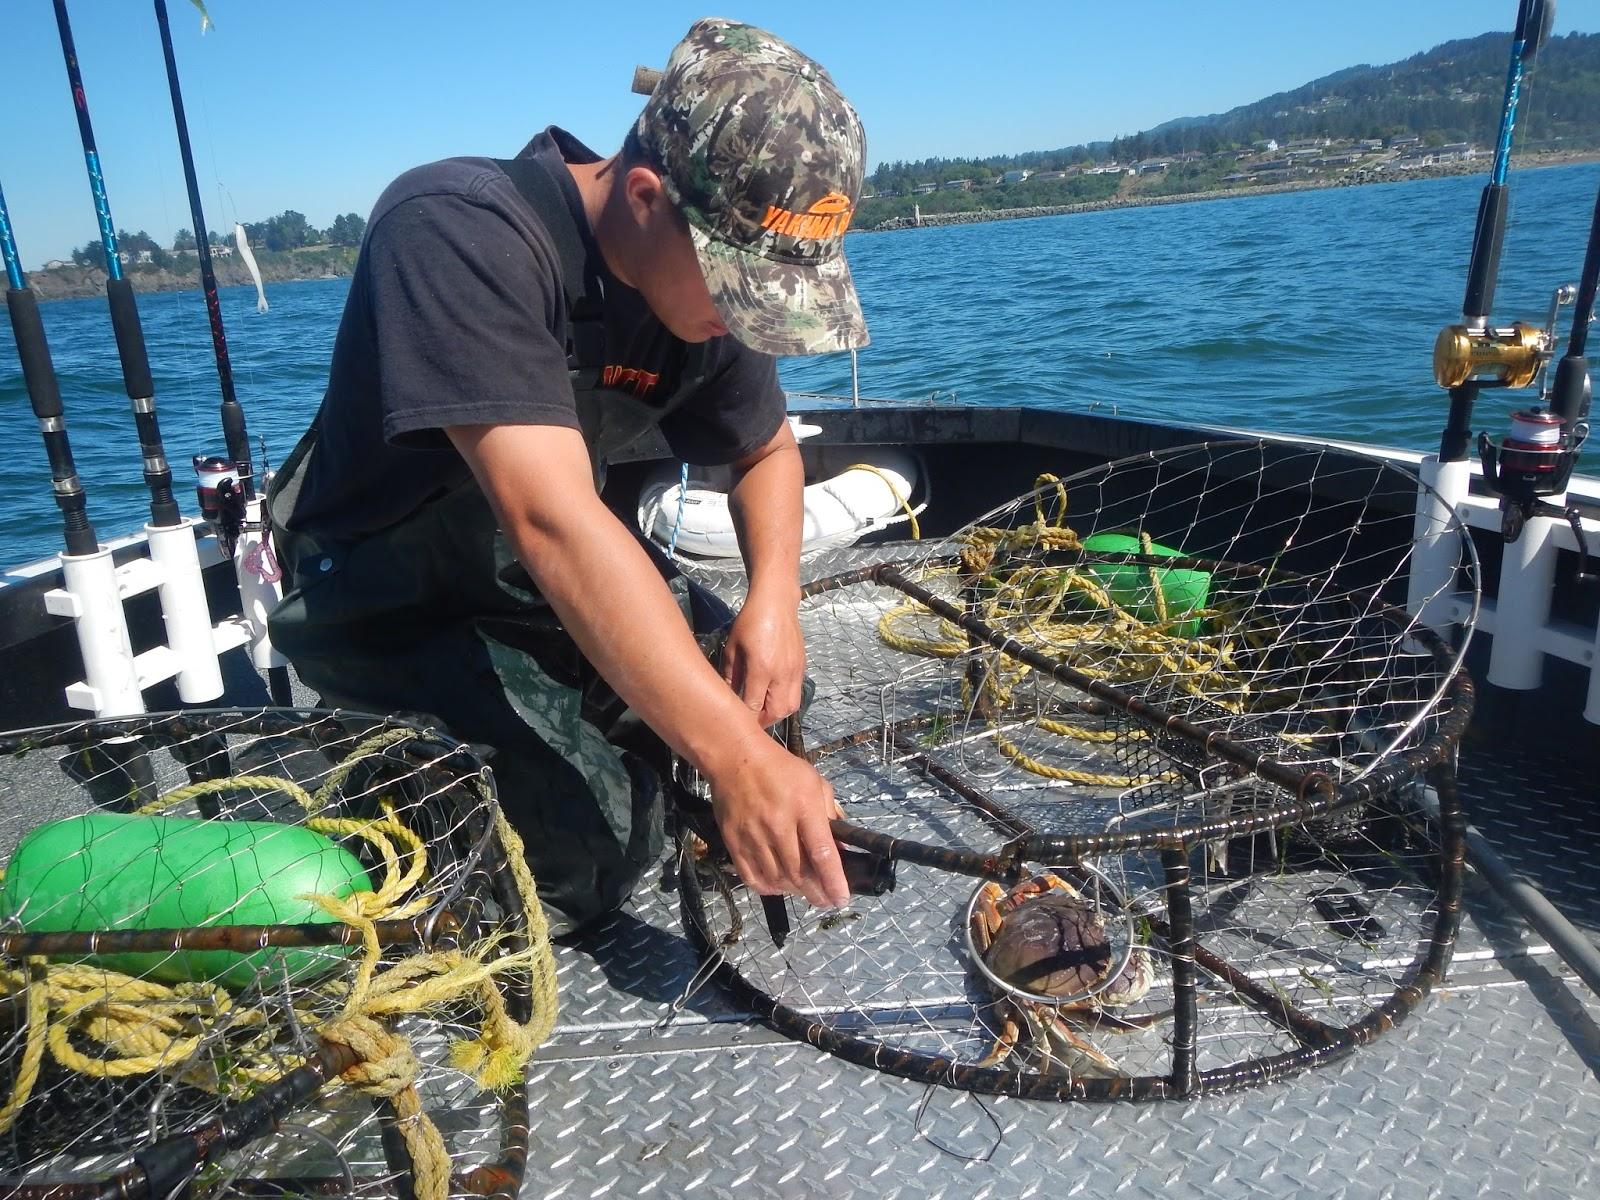 Fishing Near Brookings and Gold Beach, Oregon